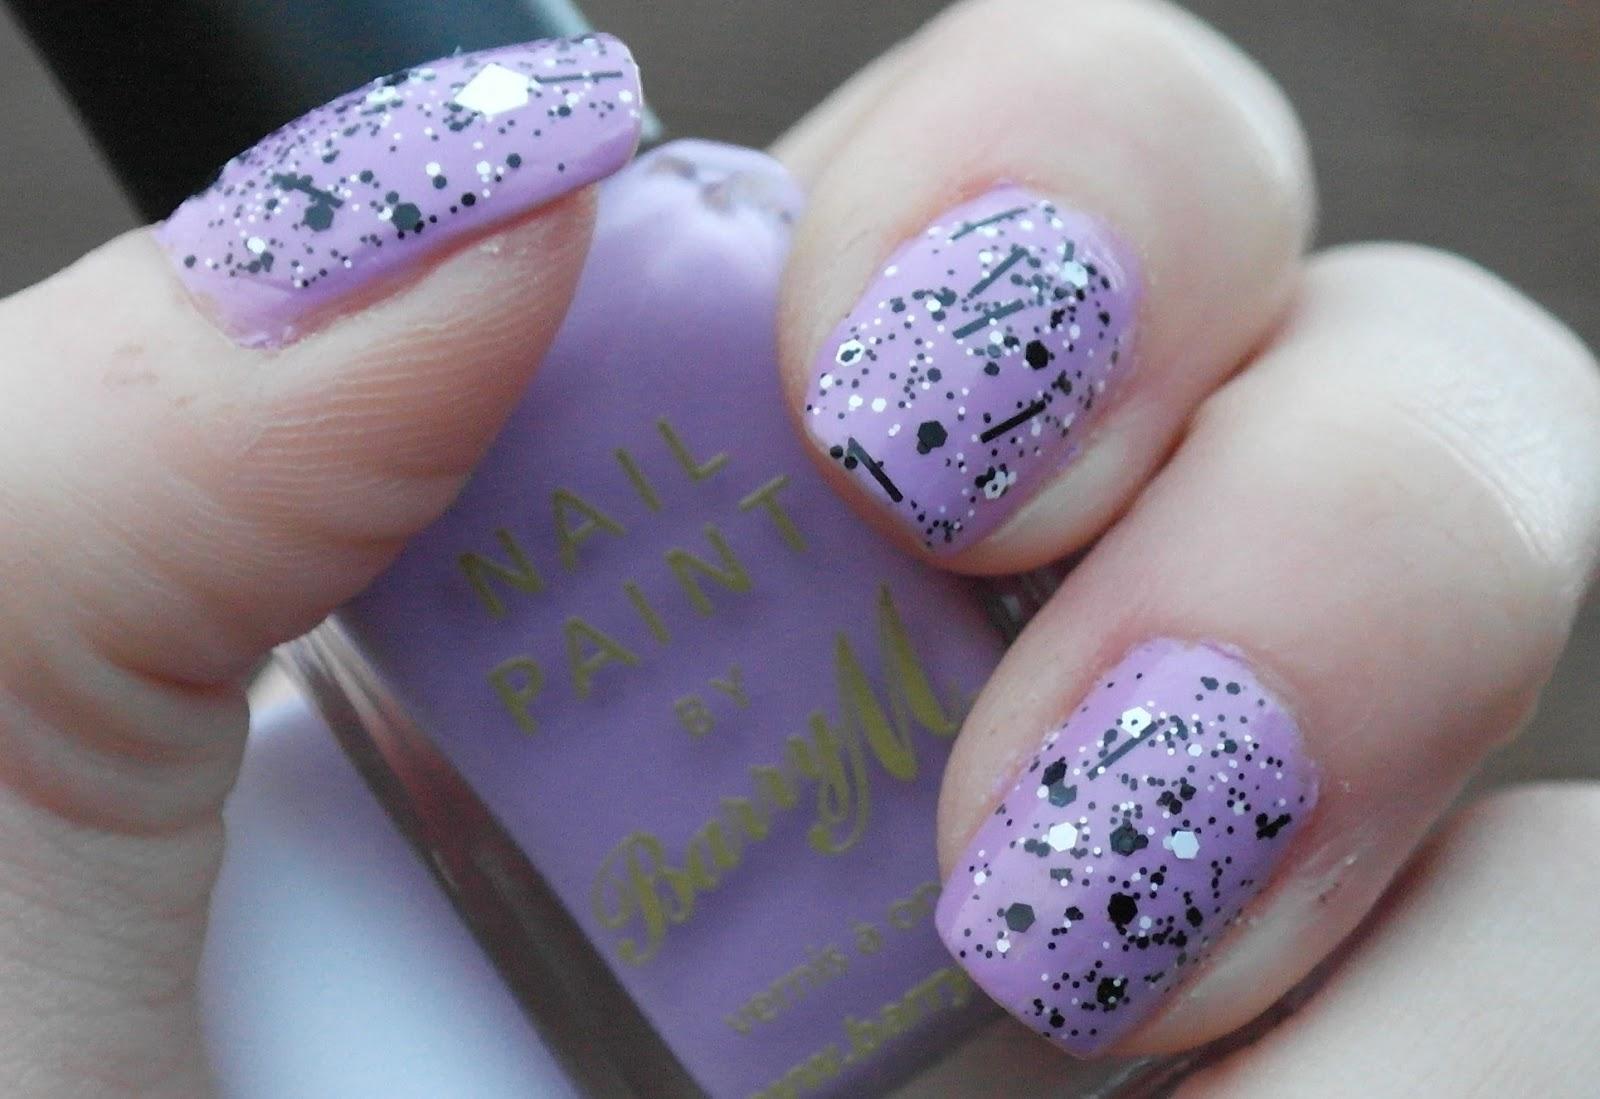 17 Off the Wall Graffiti monochrome nail polish